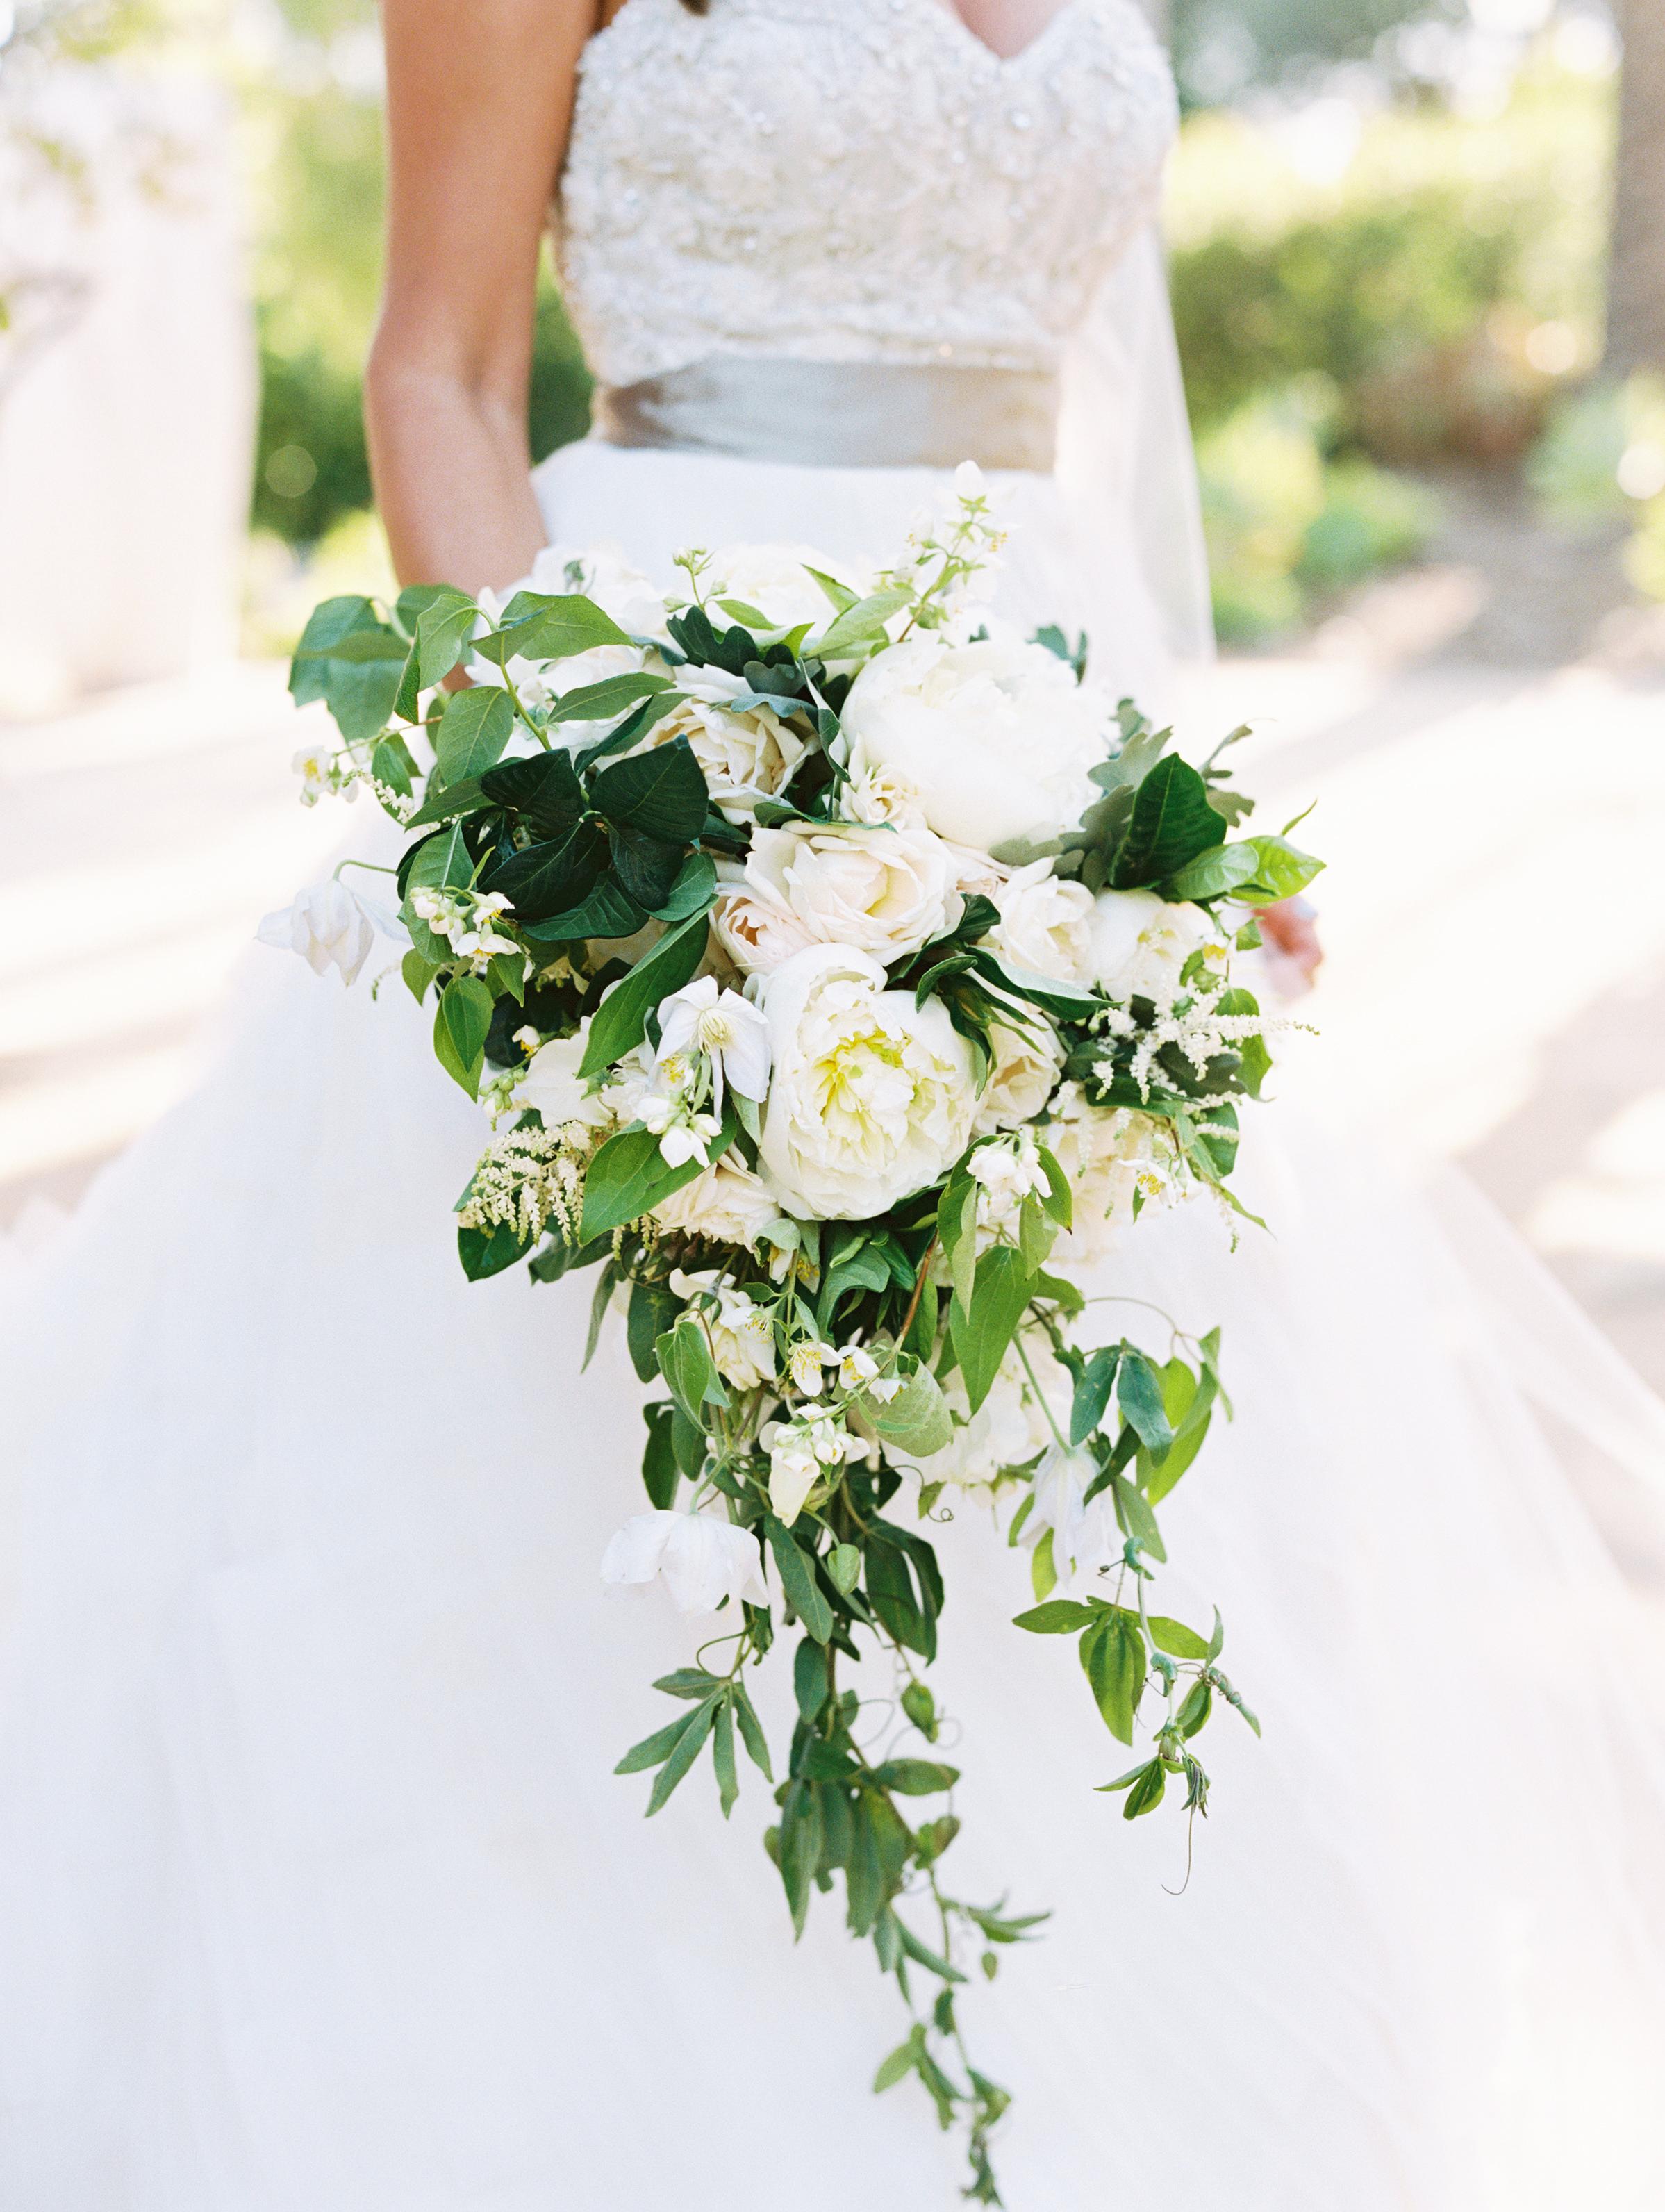 www.santabarbarawedding.com | Pat Moyer Wedding Photography & Films | Santa Barbara Historical Museum | Magnolia Weddings | Camiella Floral Designs | Bridal Bouquet